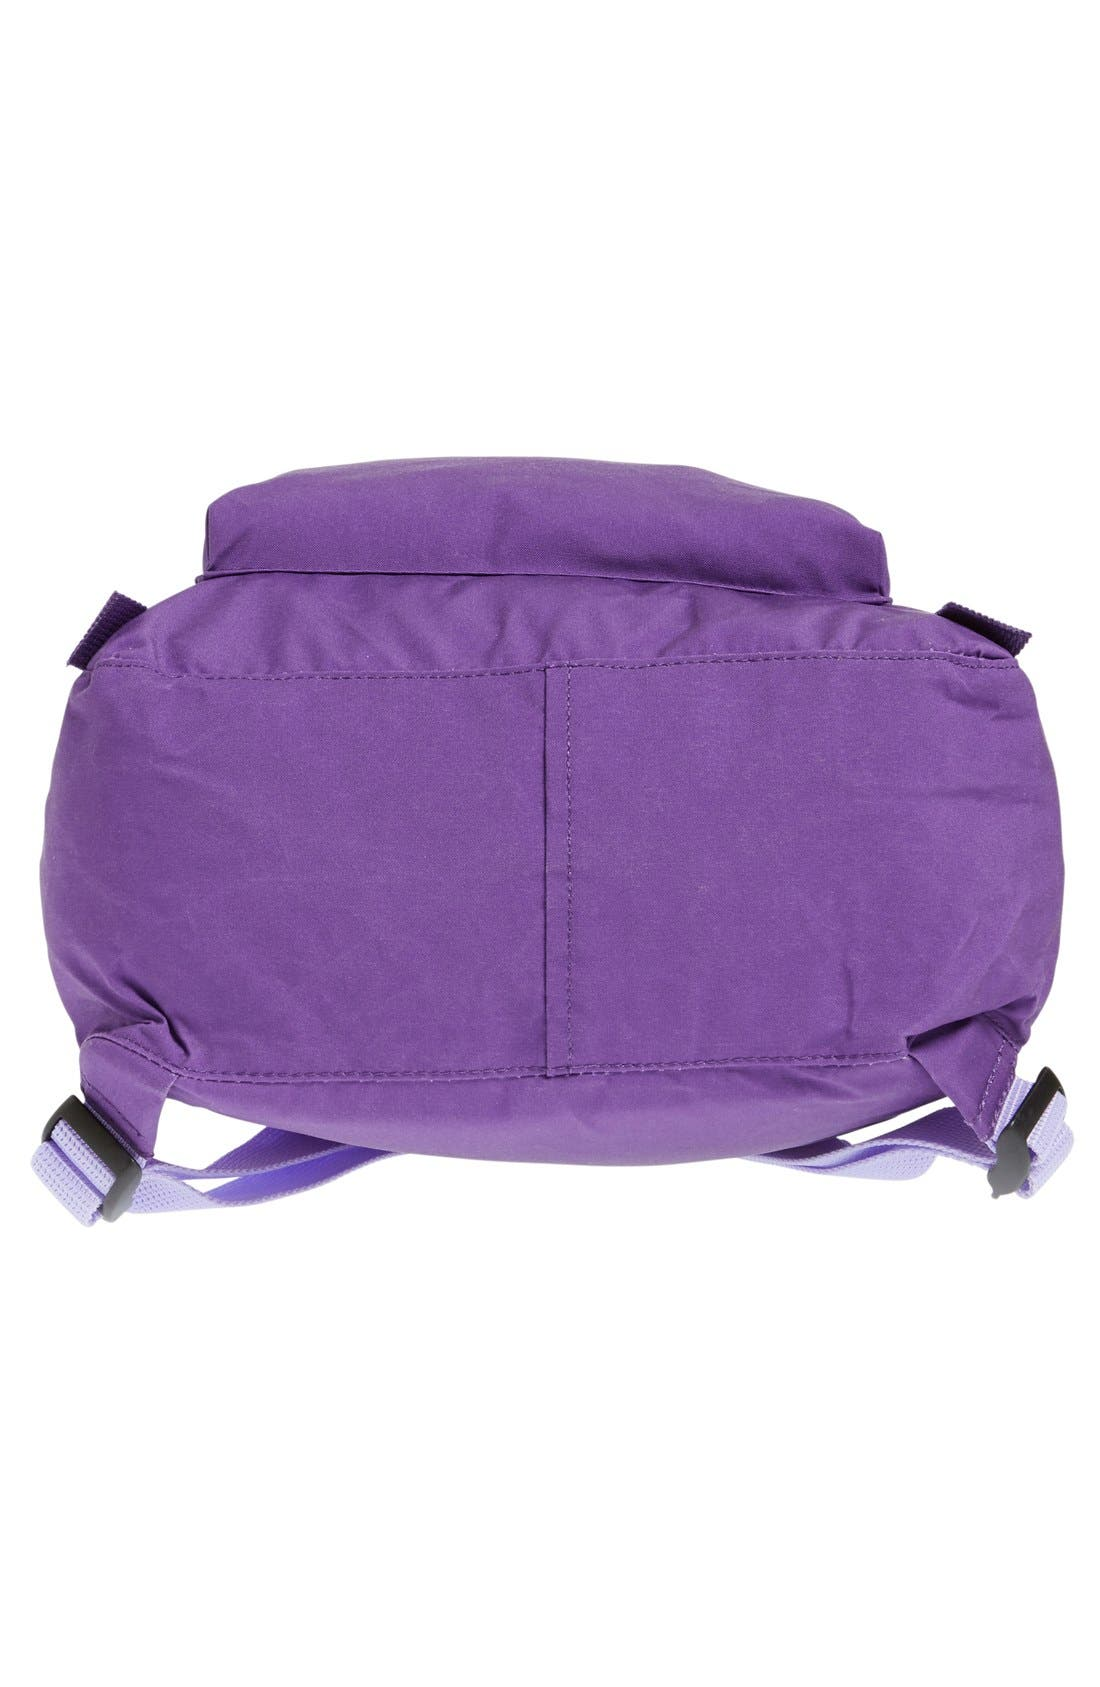 'Kånken' Water Resistant Backpack,                             Alternate thumbnail 337, color,